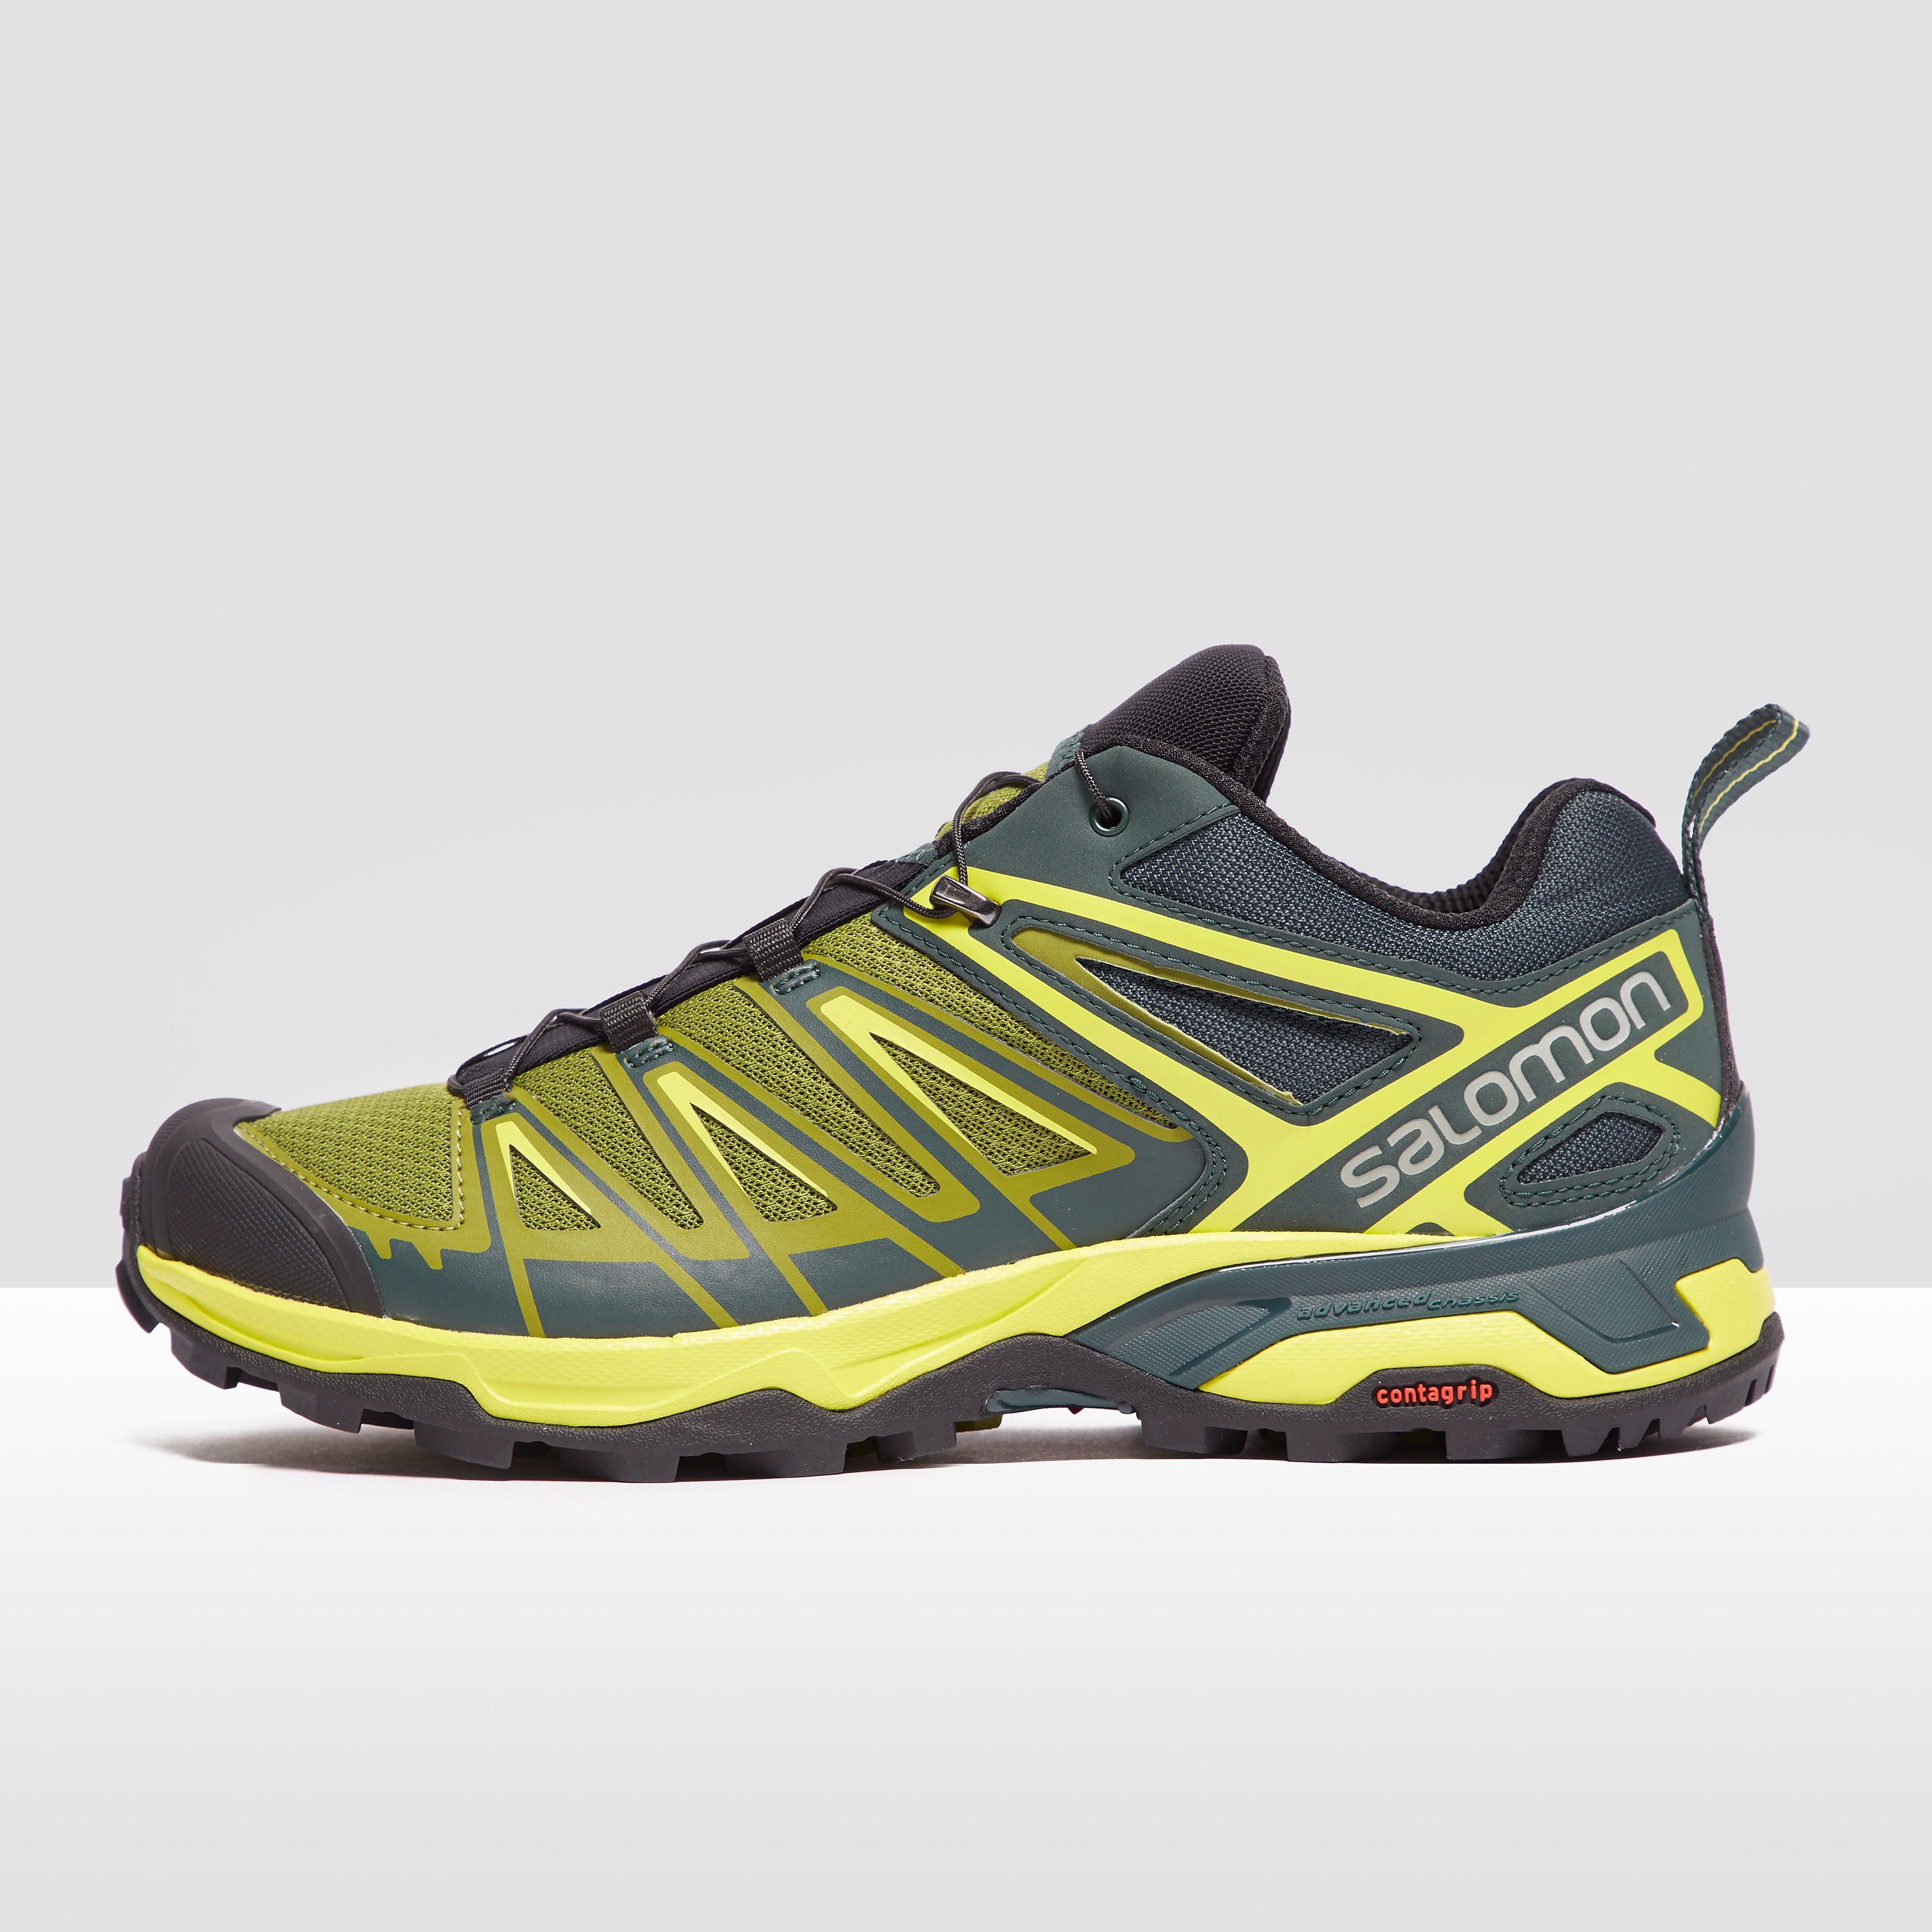 Salomon X Ultra 3 Men's Hiking Shoes